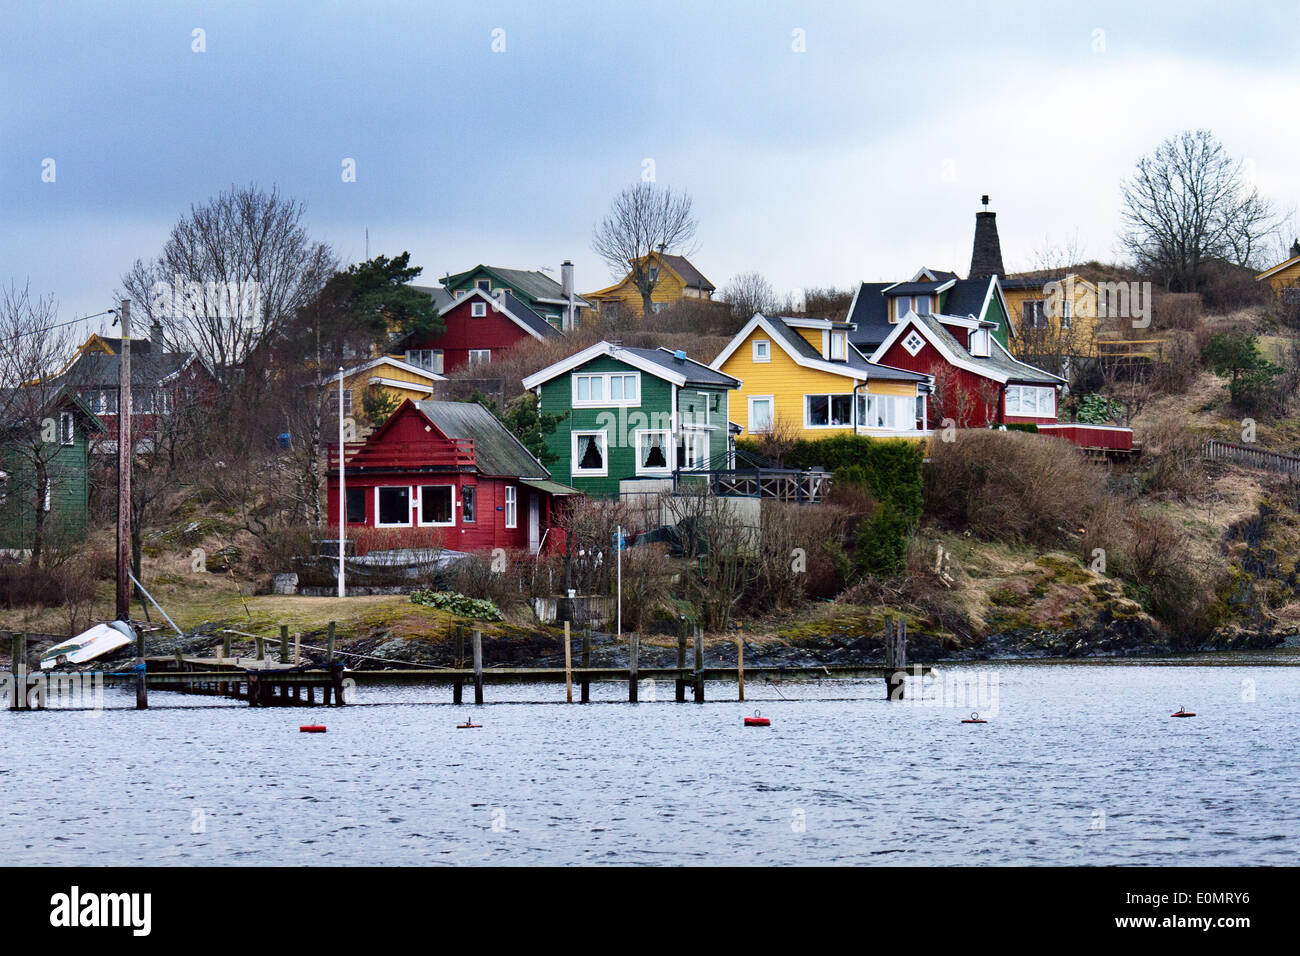 Europe; Norway; Oslo; Winter; Sea; Archipelago; house; coloured houses; lifestyle; wood; land; panorama; tipycal; Stock Photo